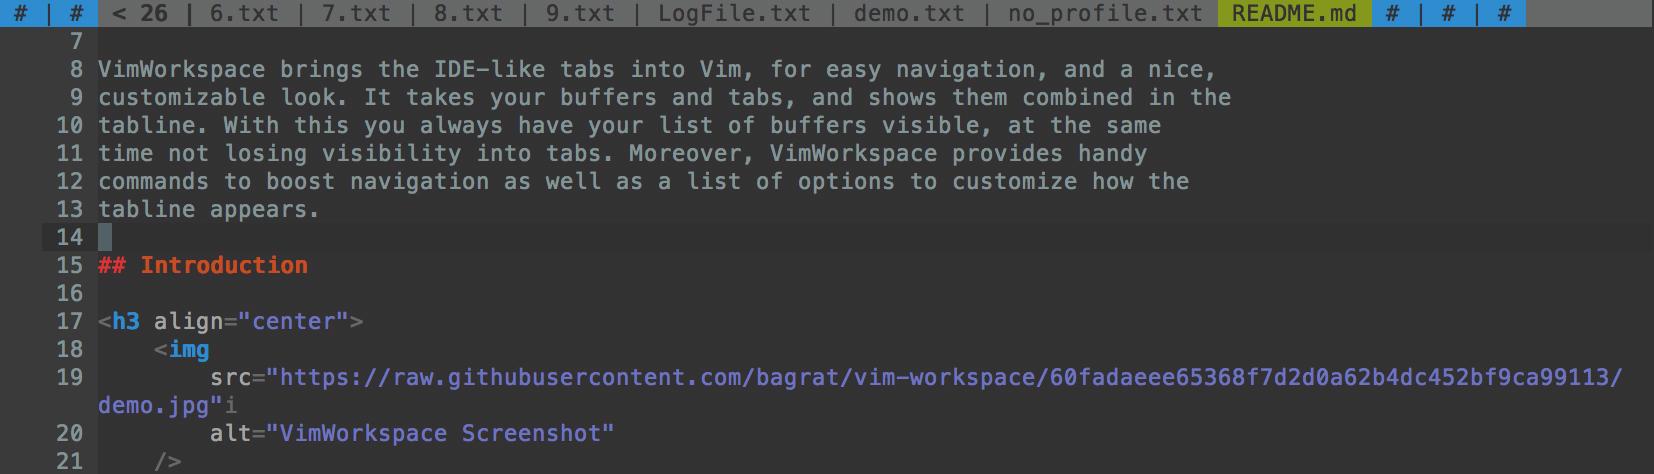 VimWorkspace Screenshot